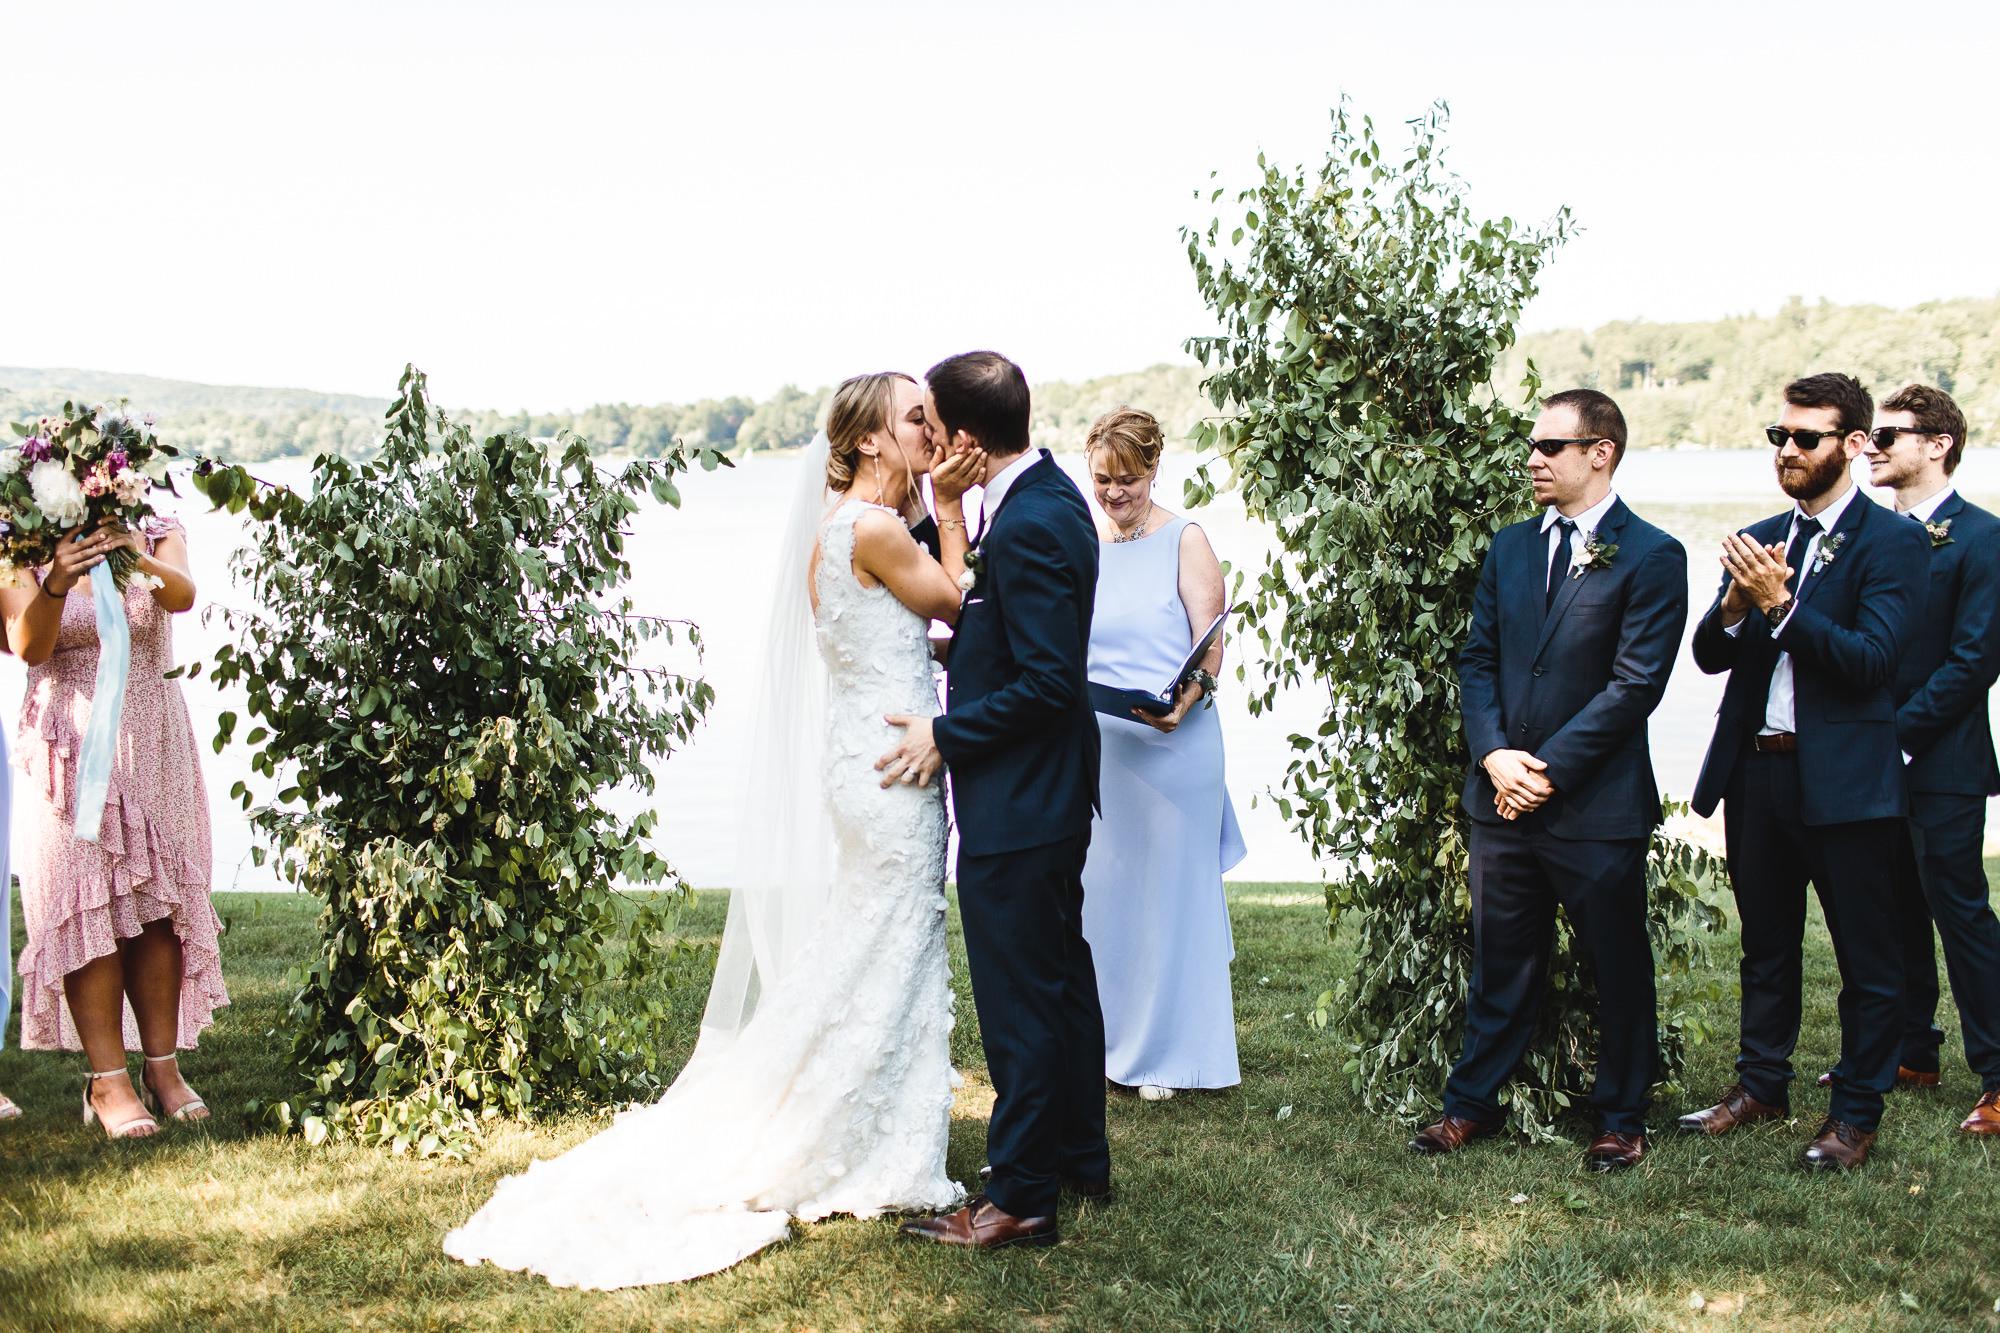 connecticut-summer-lake-wedding-emily-kirke-photography-upstyle (101 of 181).jpg